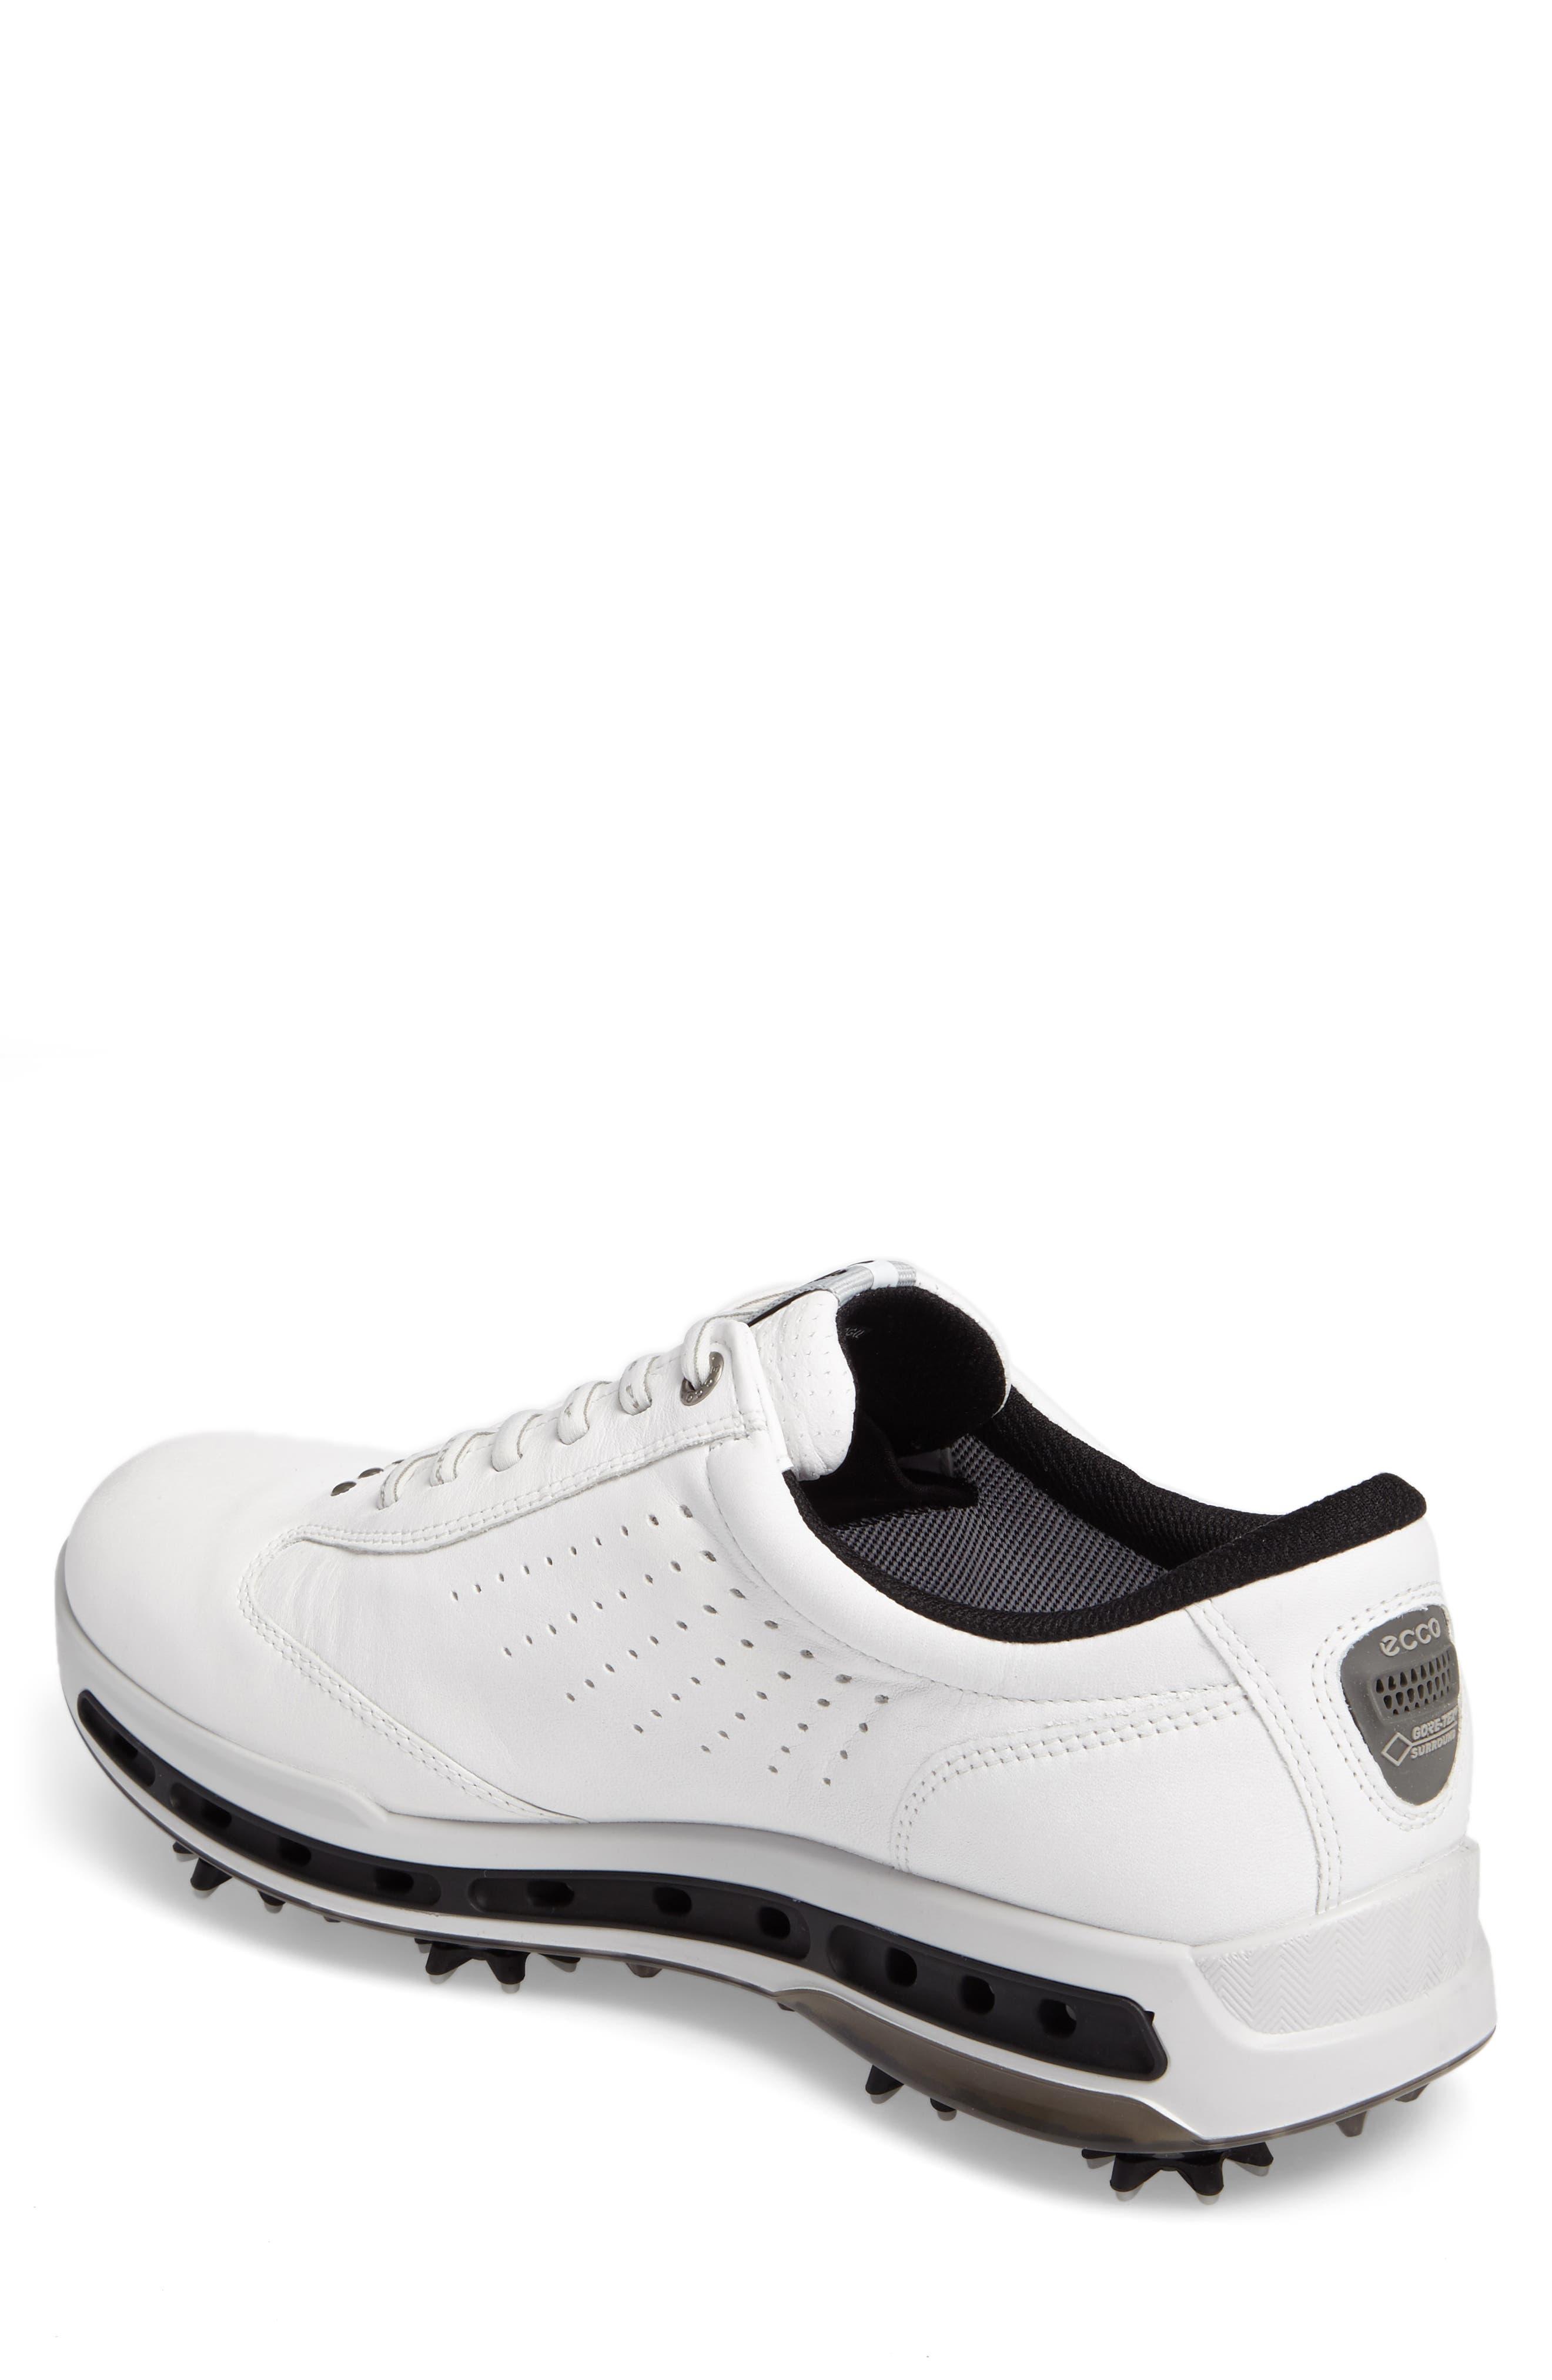 Cool GTX Golf Shoe,                             Alternate thumbnail 2, color,                             White/ Black